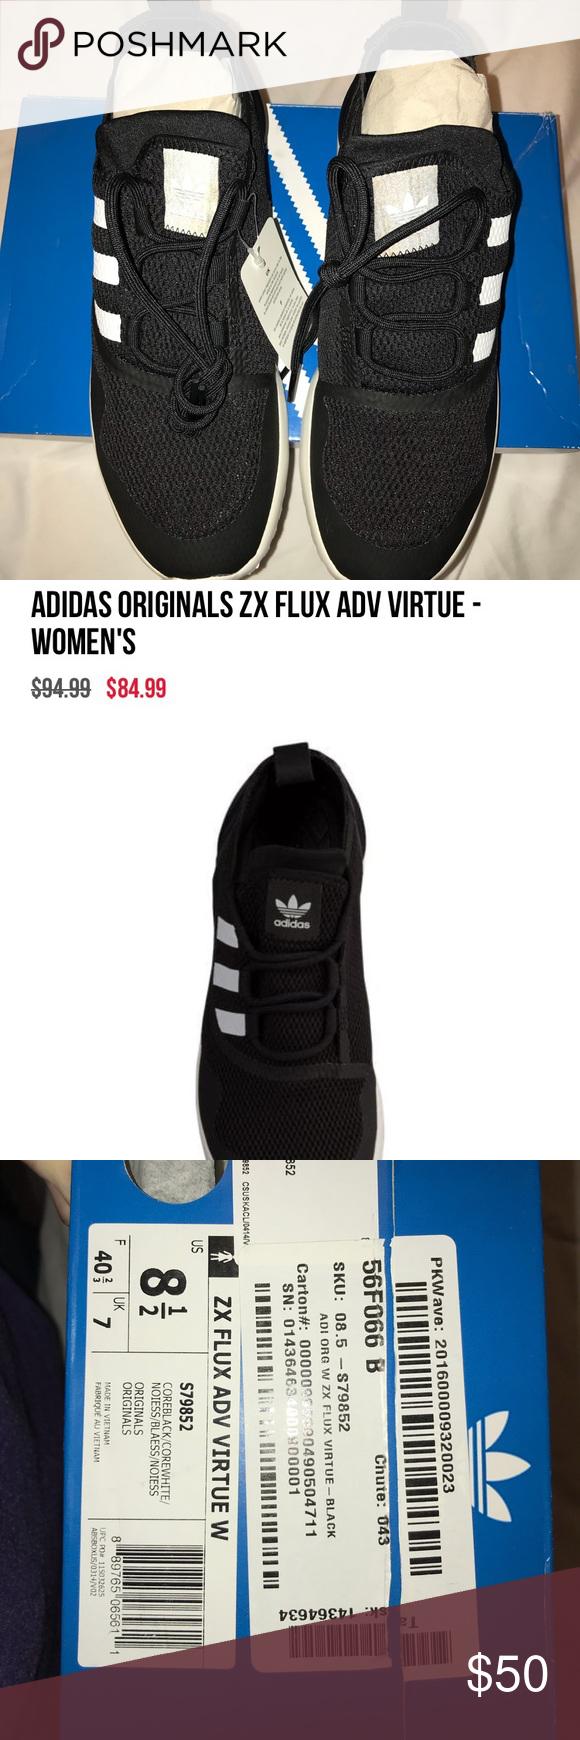 adidas zx flux smoke rose